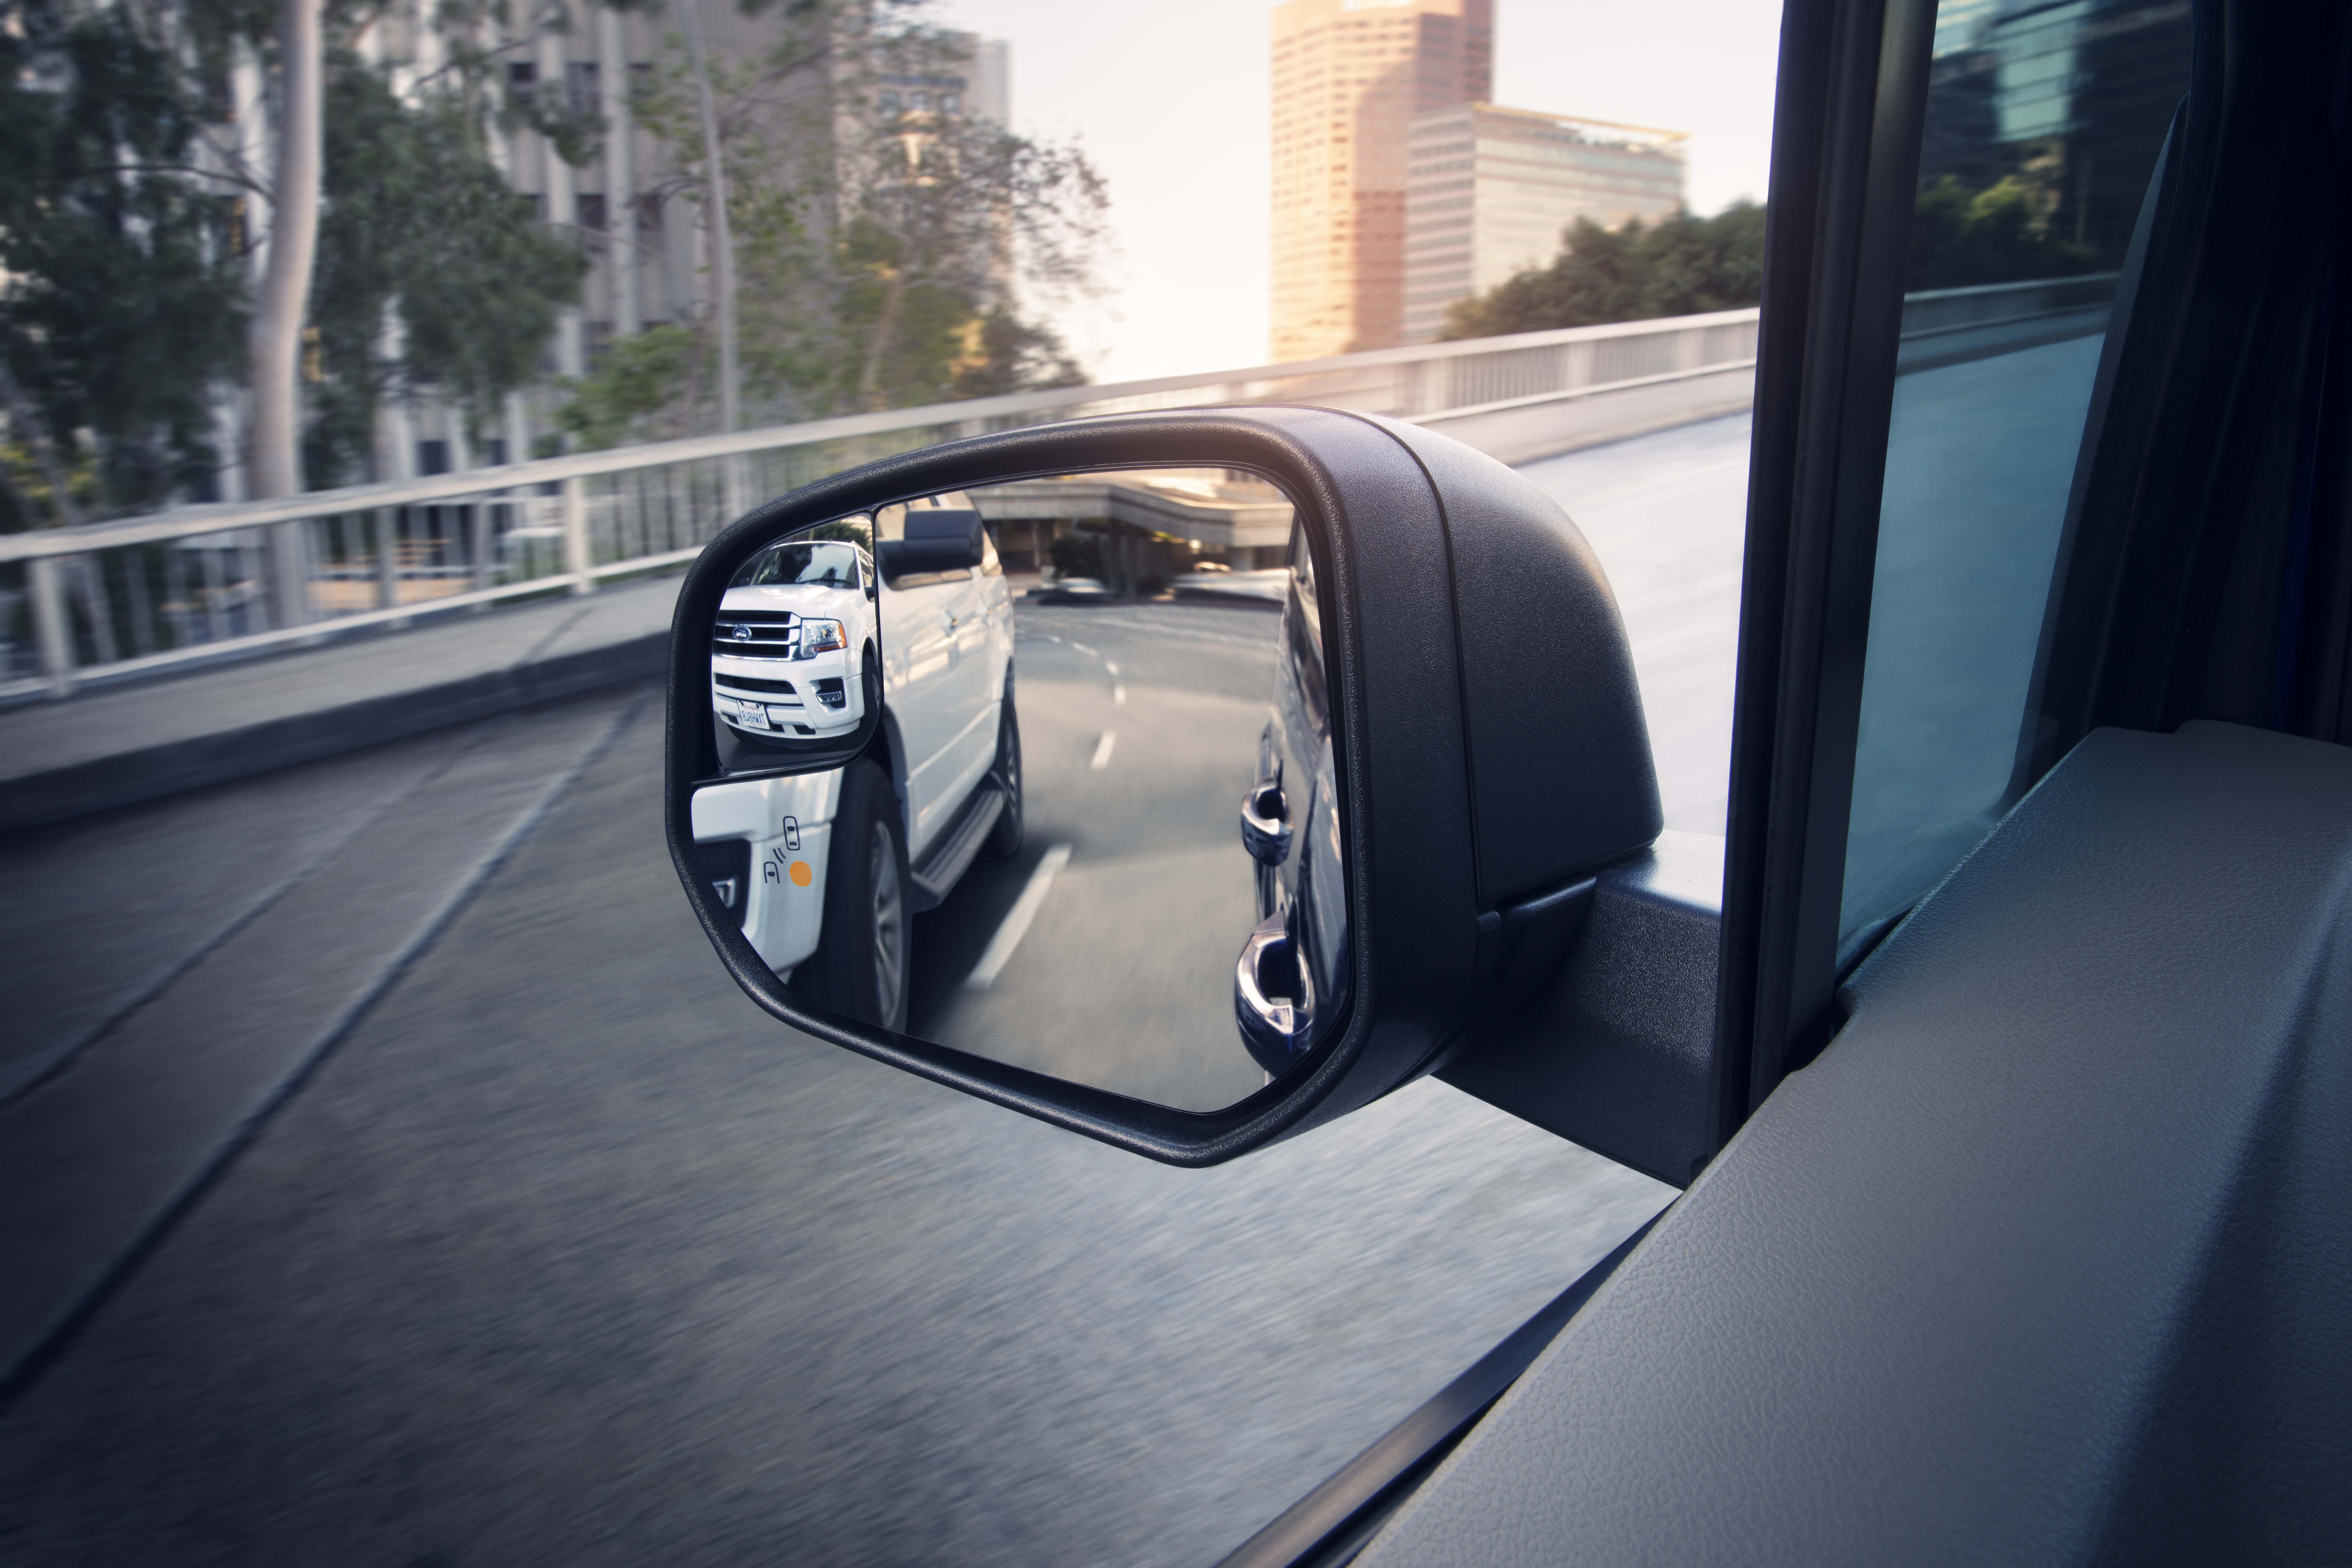 2019 Ford Transit side mirror